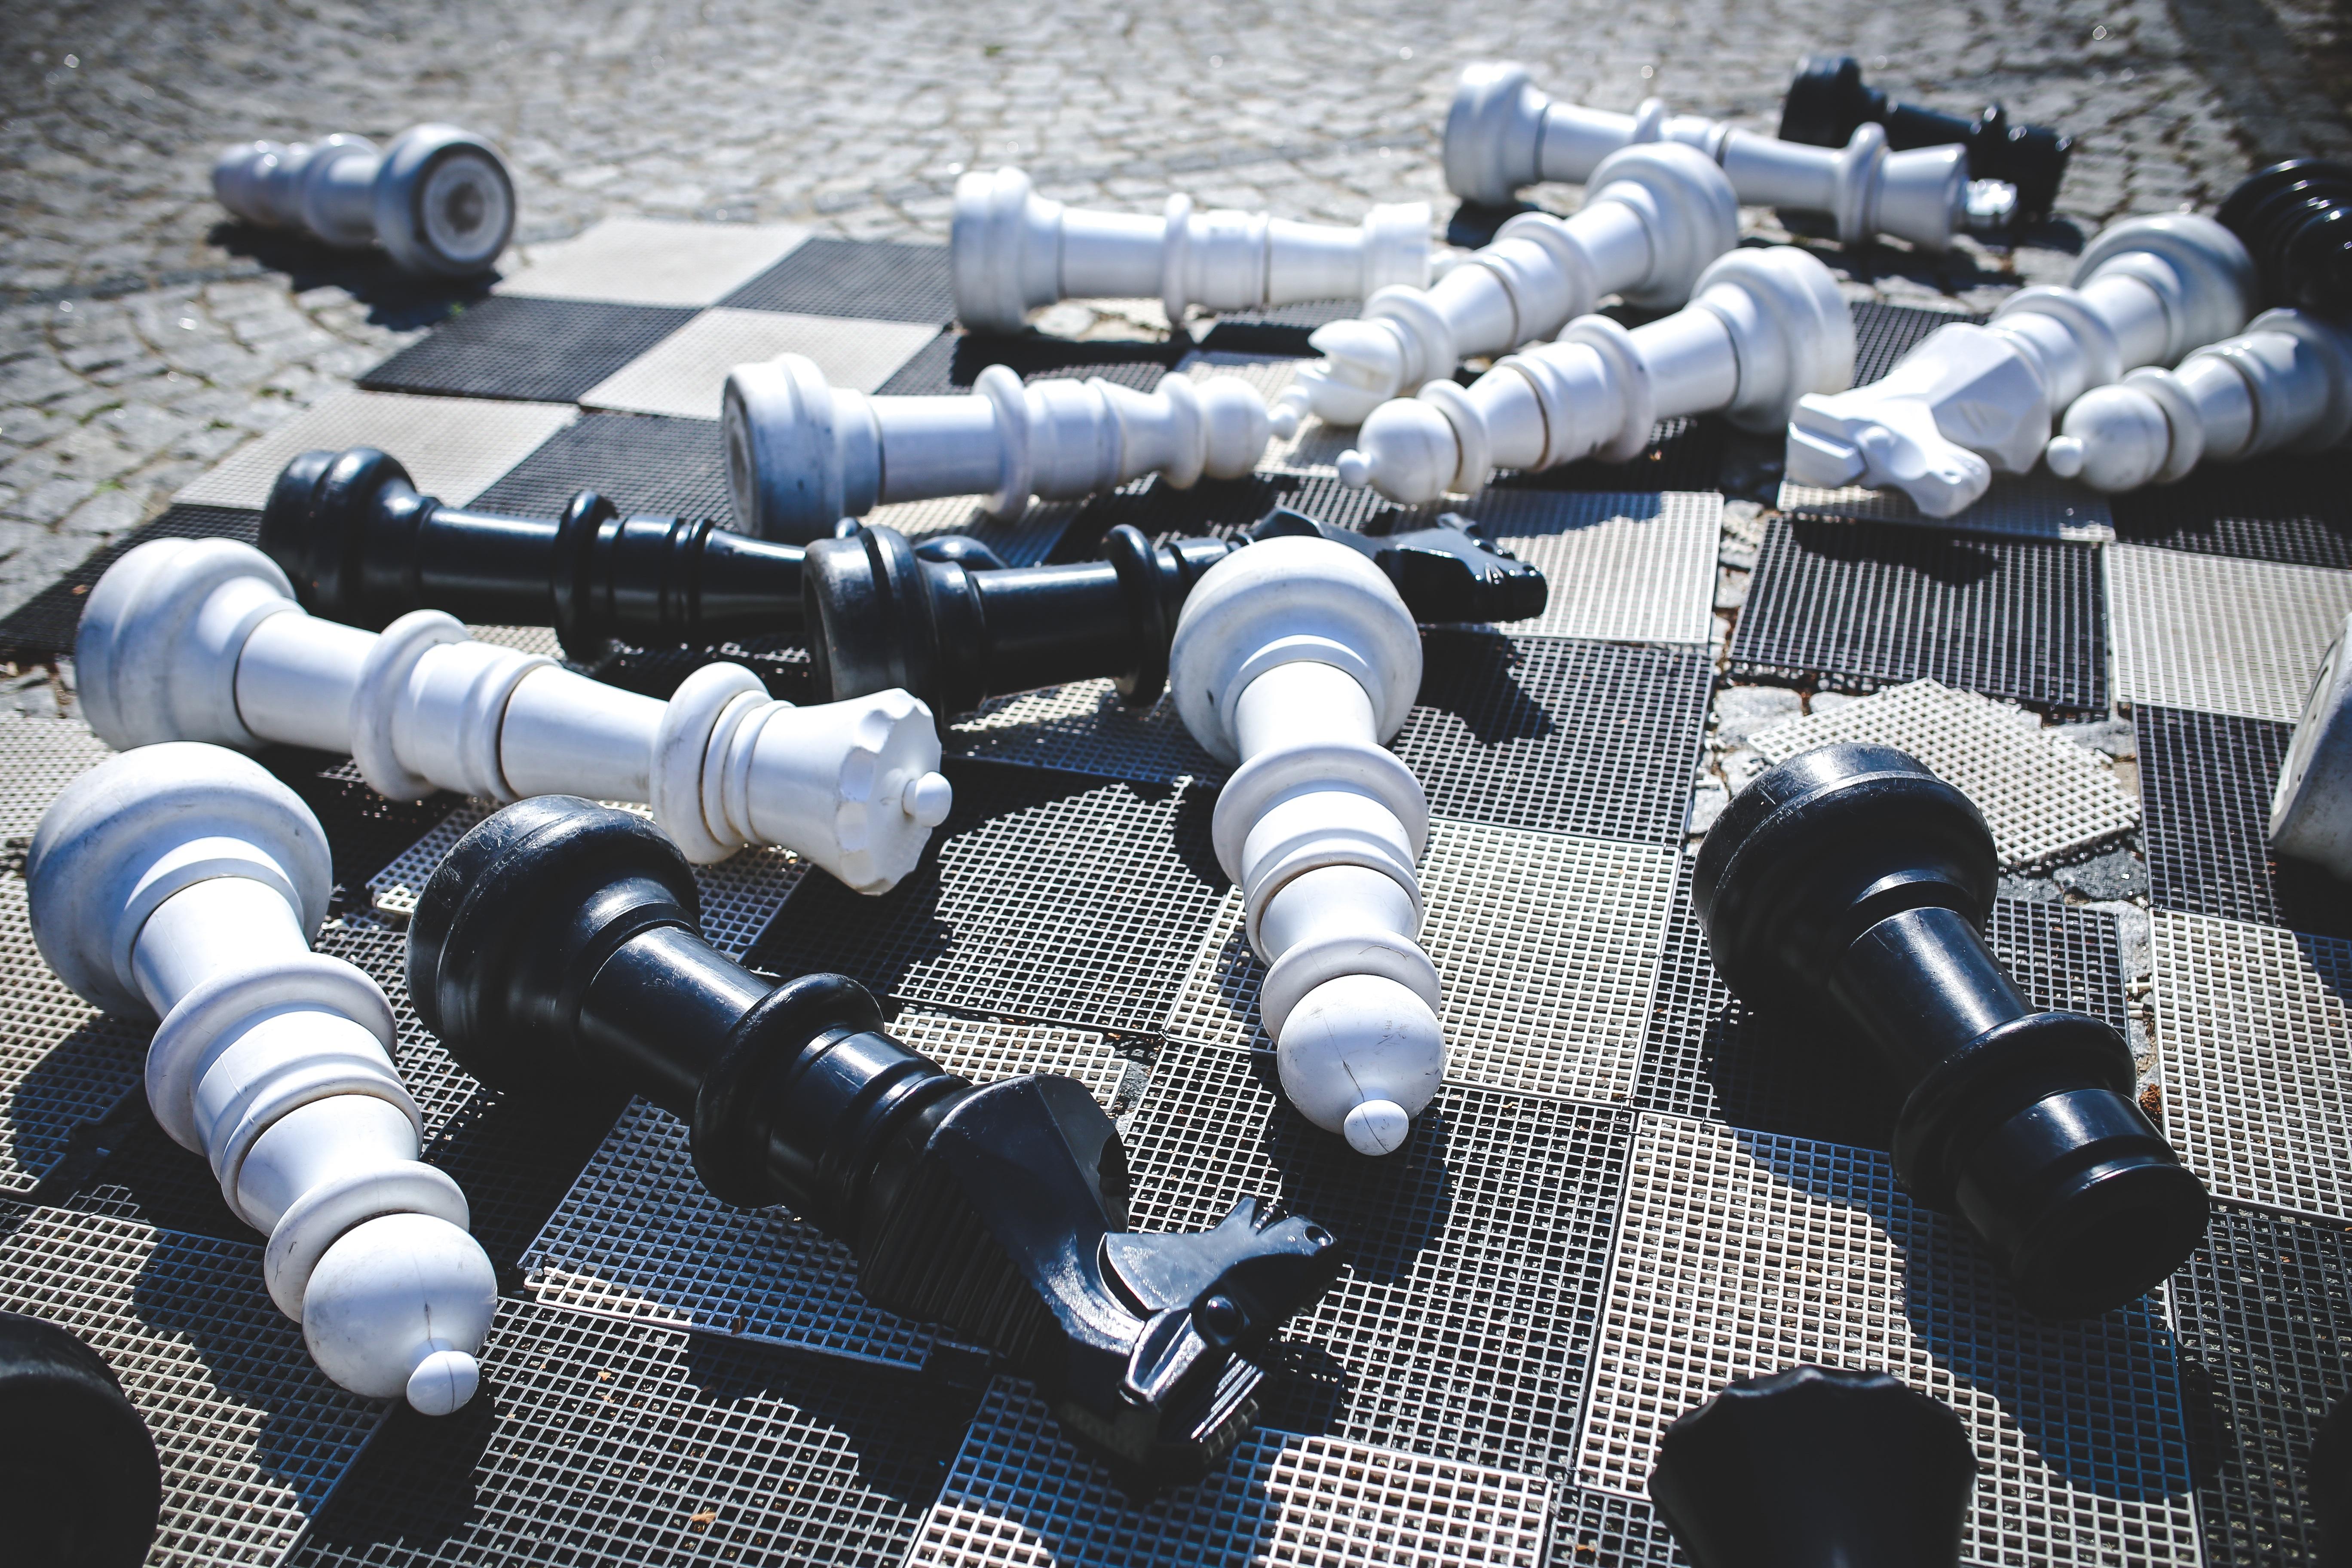 Free Images : street, game, vehicle, black white, chess